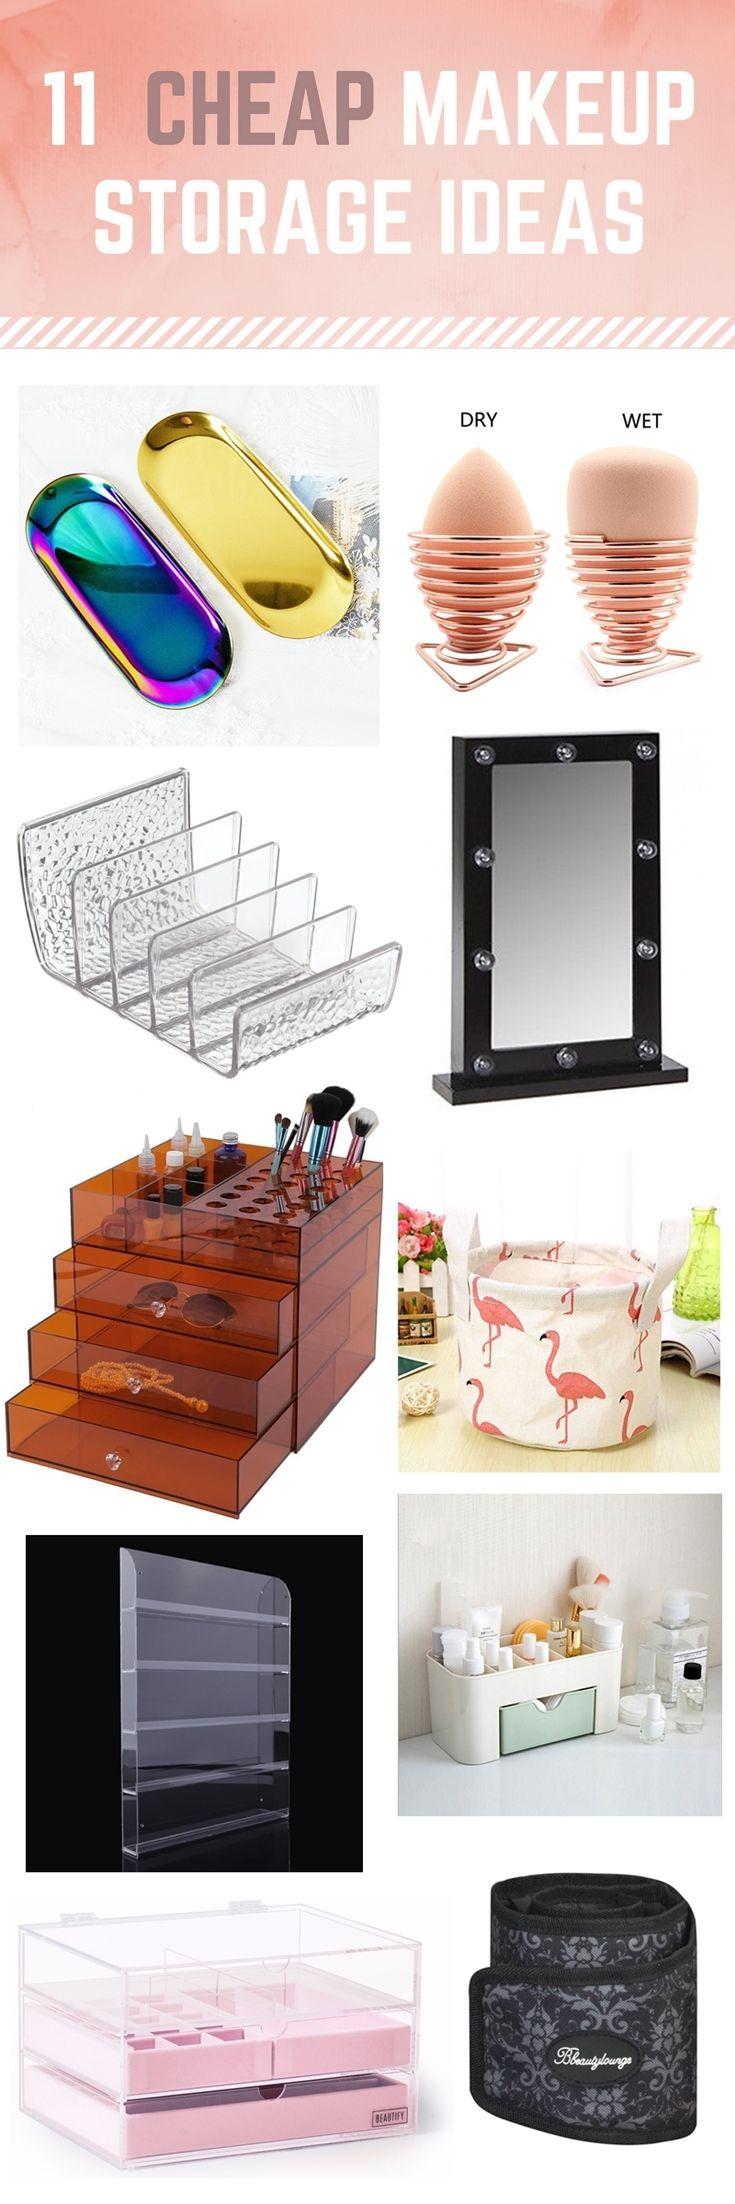 eBay Bargains Makeup Storage Solutions Makeup storage